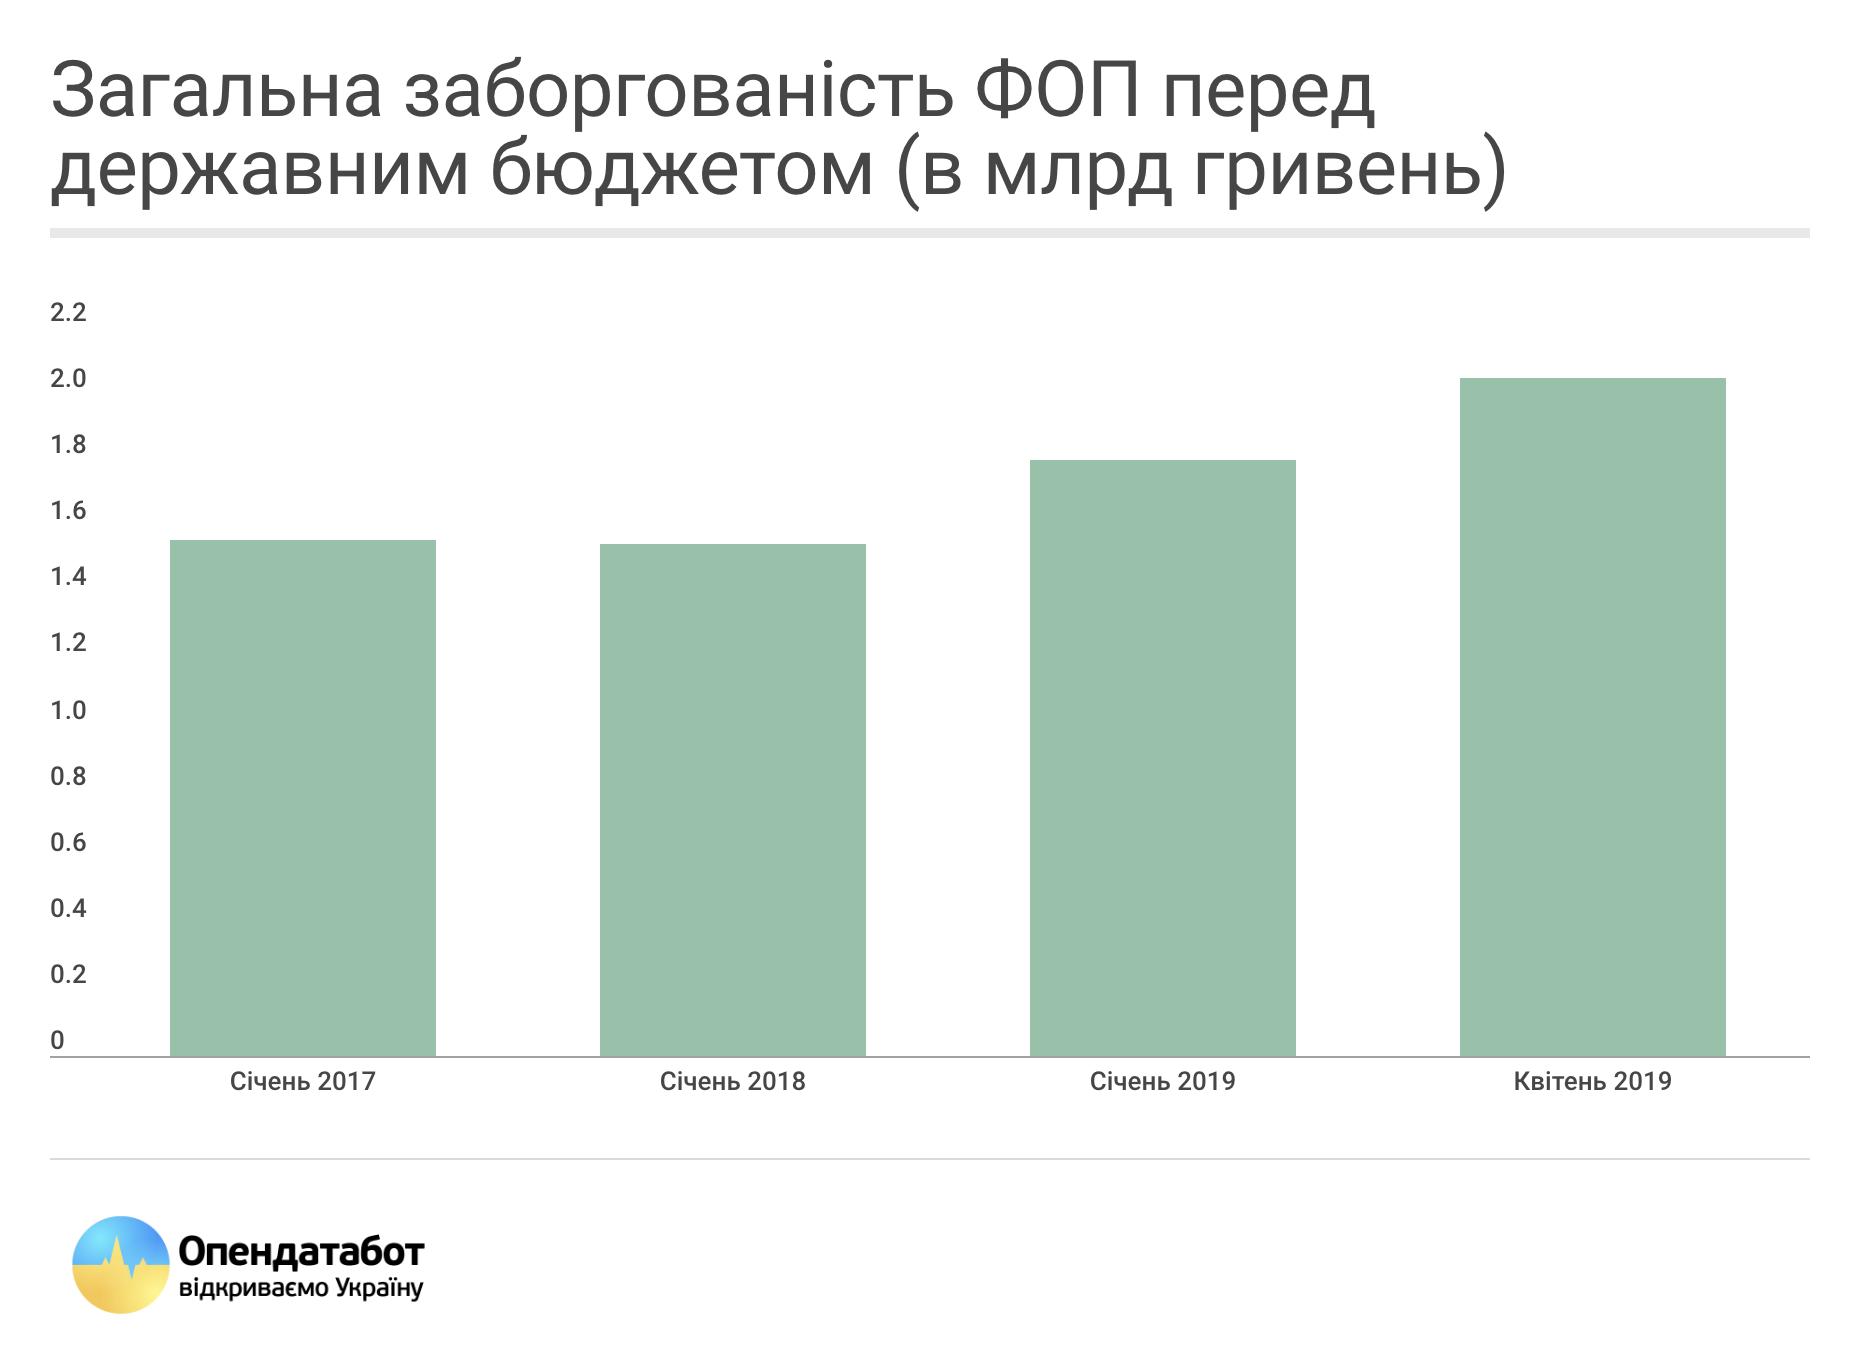 Общий долг ФЛП перед госбюджетом